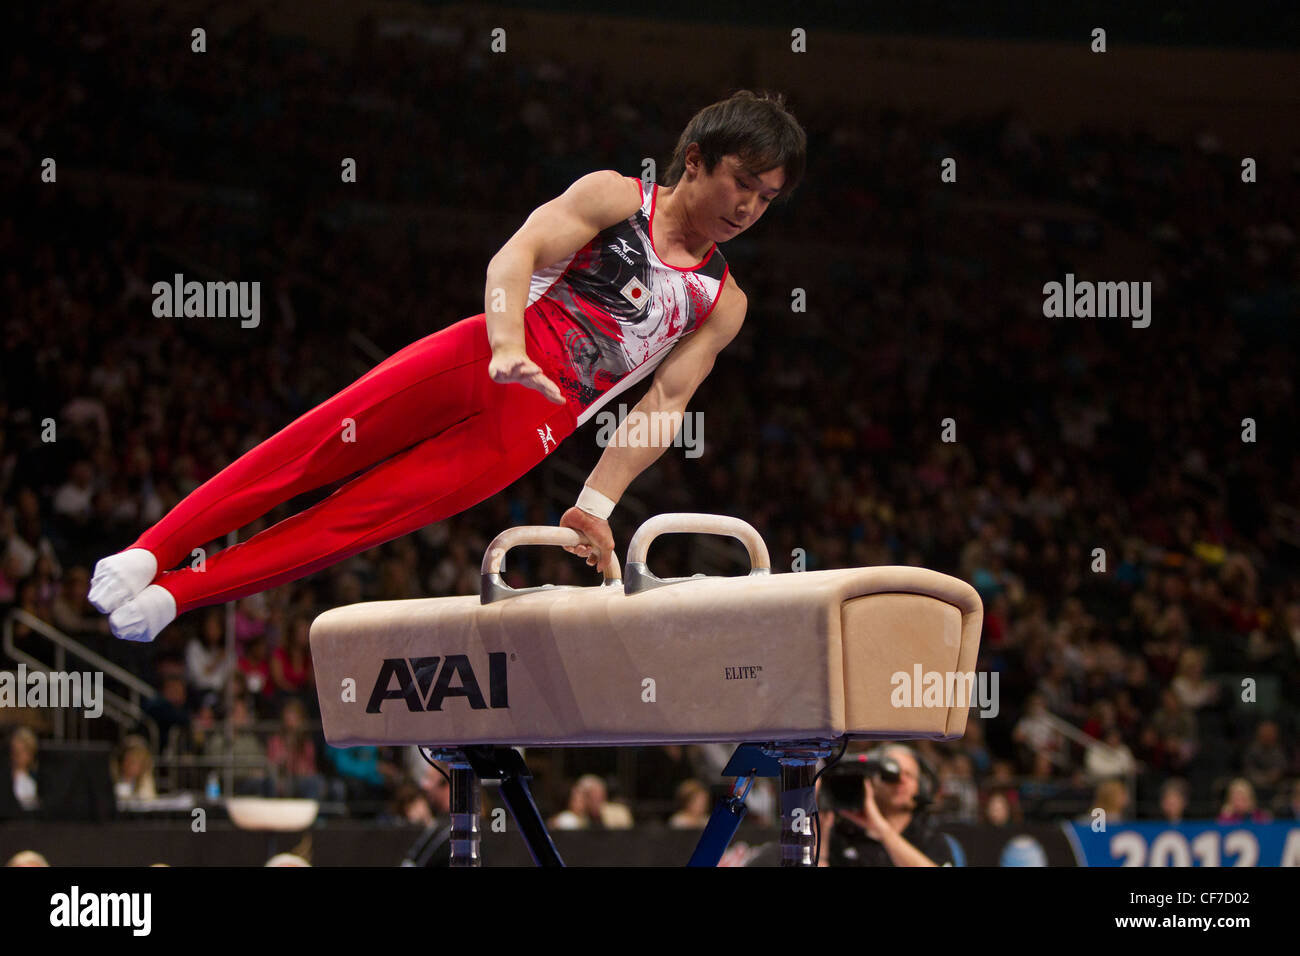 Ryuzo Sejima (JPN) compite en la empuñadura del caballo en el evento 2012 Copa Americana Gimnasia Imagen De Stock